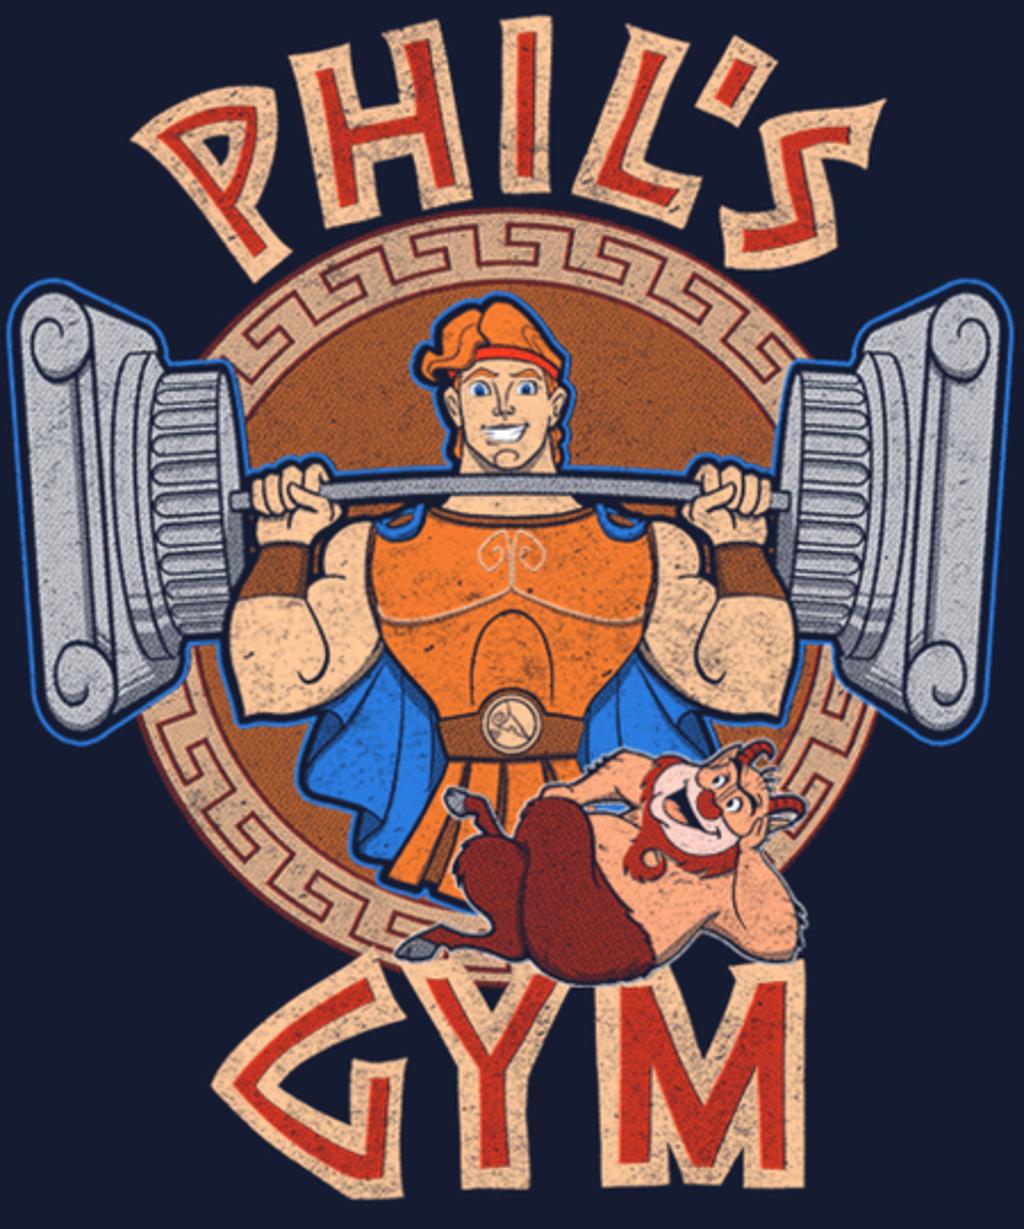 Qwertee: Phil's Gym